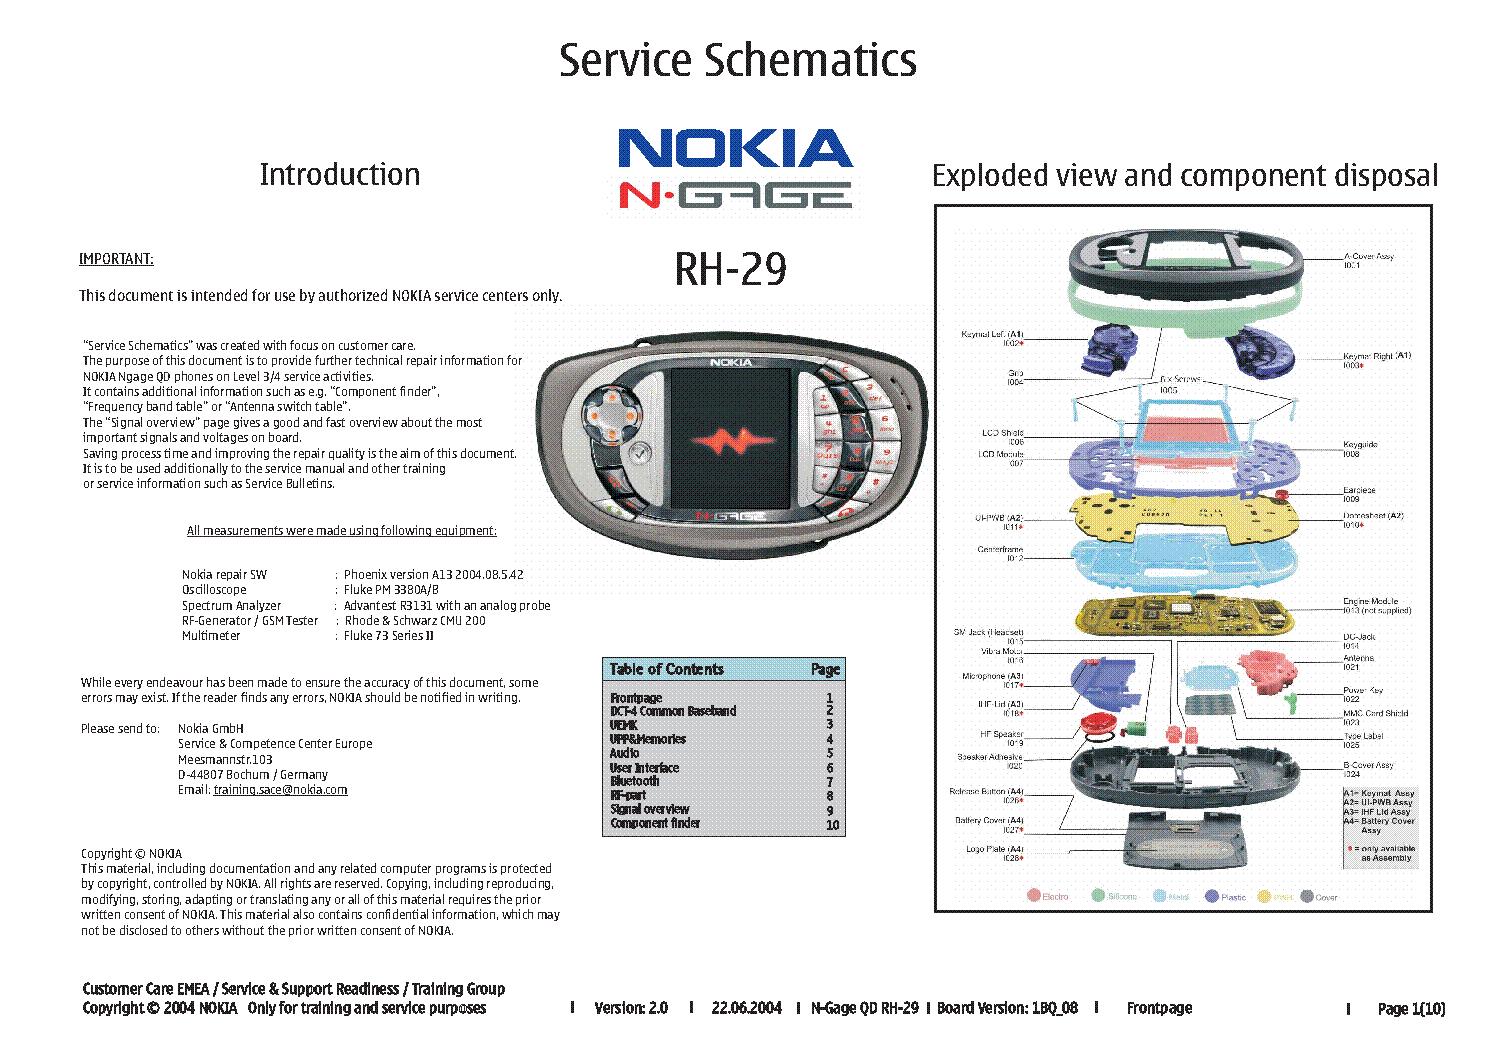 nokia n gage rh 29 service schematics service manual download rh elektrotanya com Nokia N95 Nokia 6610